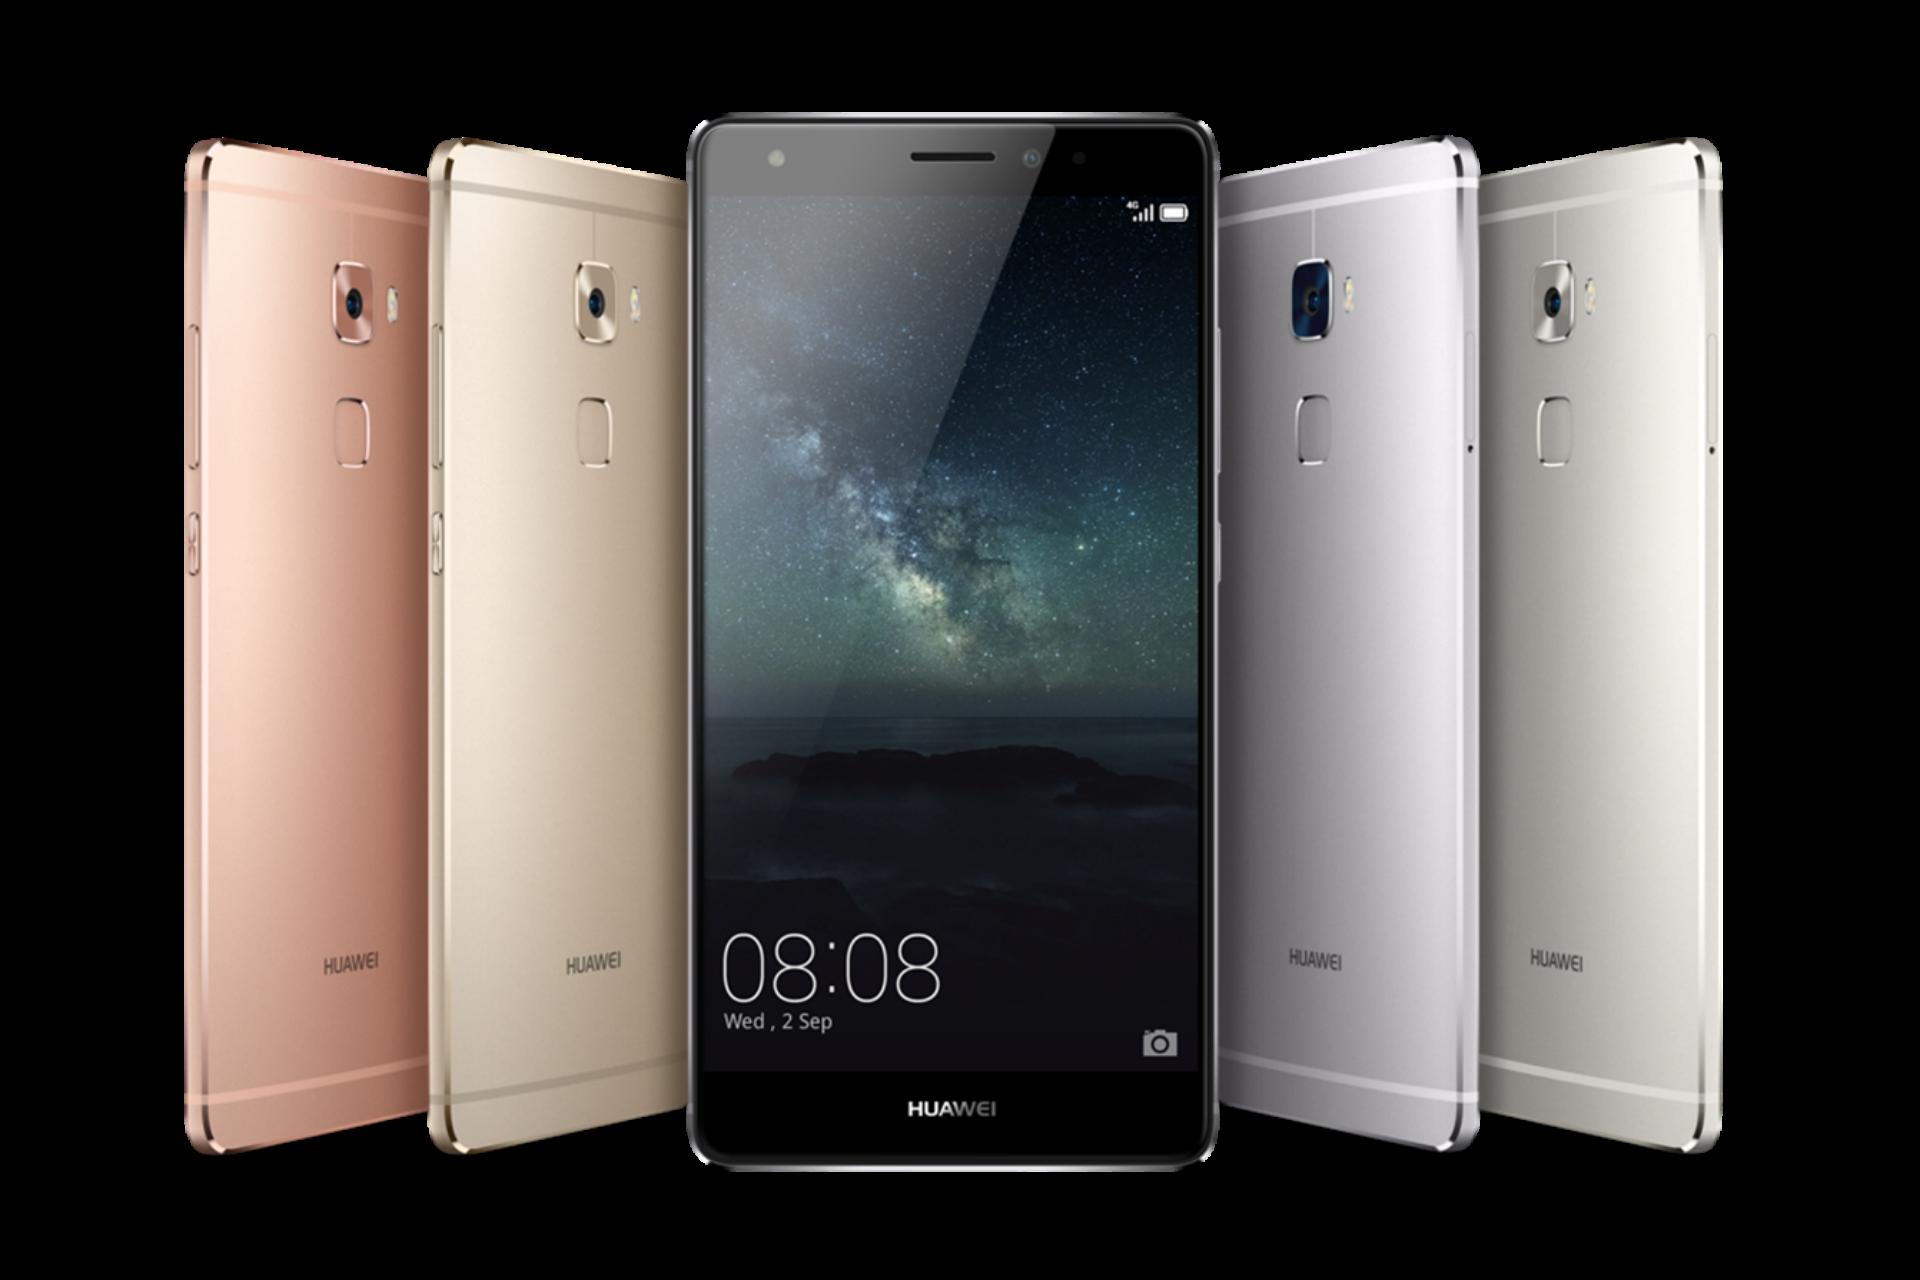 Huawei d voile le mate s un smartphone haut de gamme - Sauna infrarouge haut de gamme ...